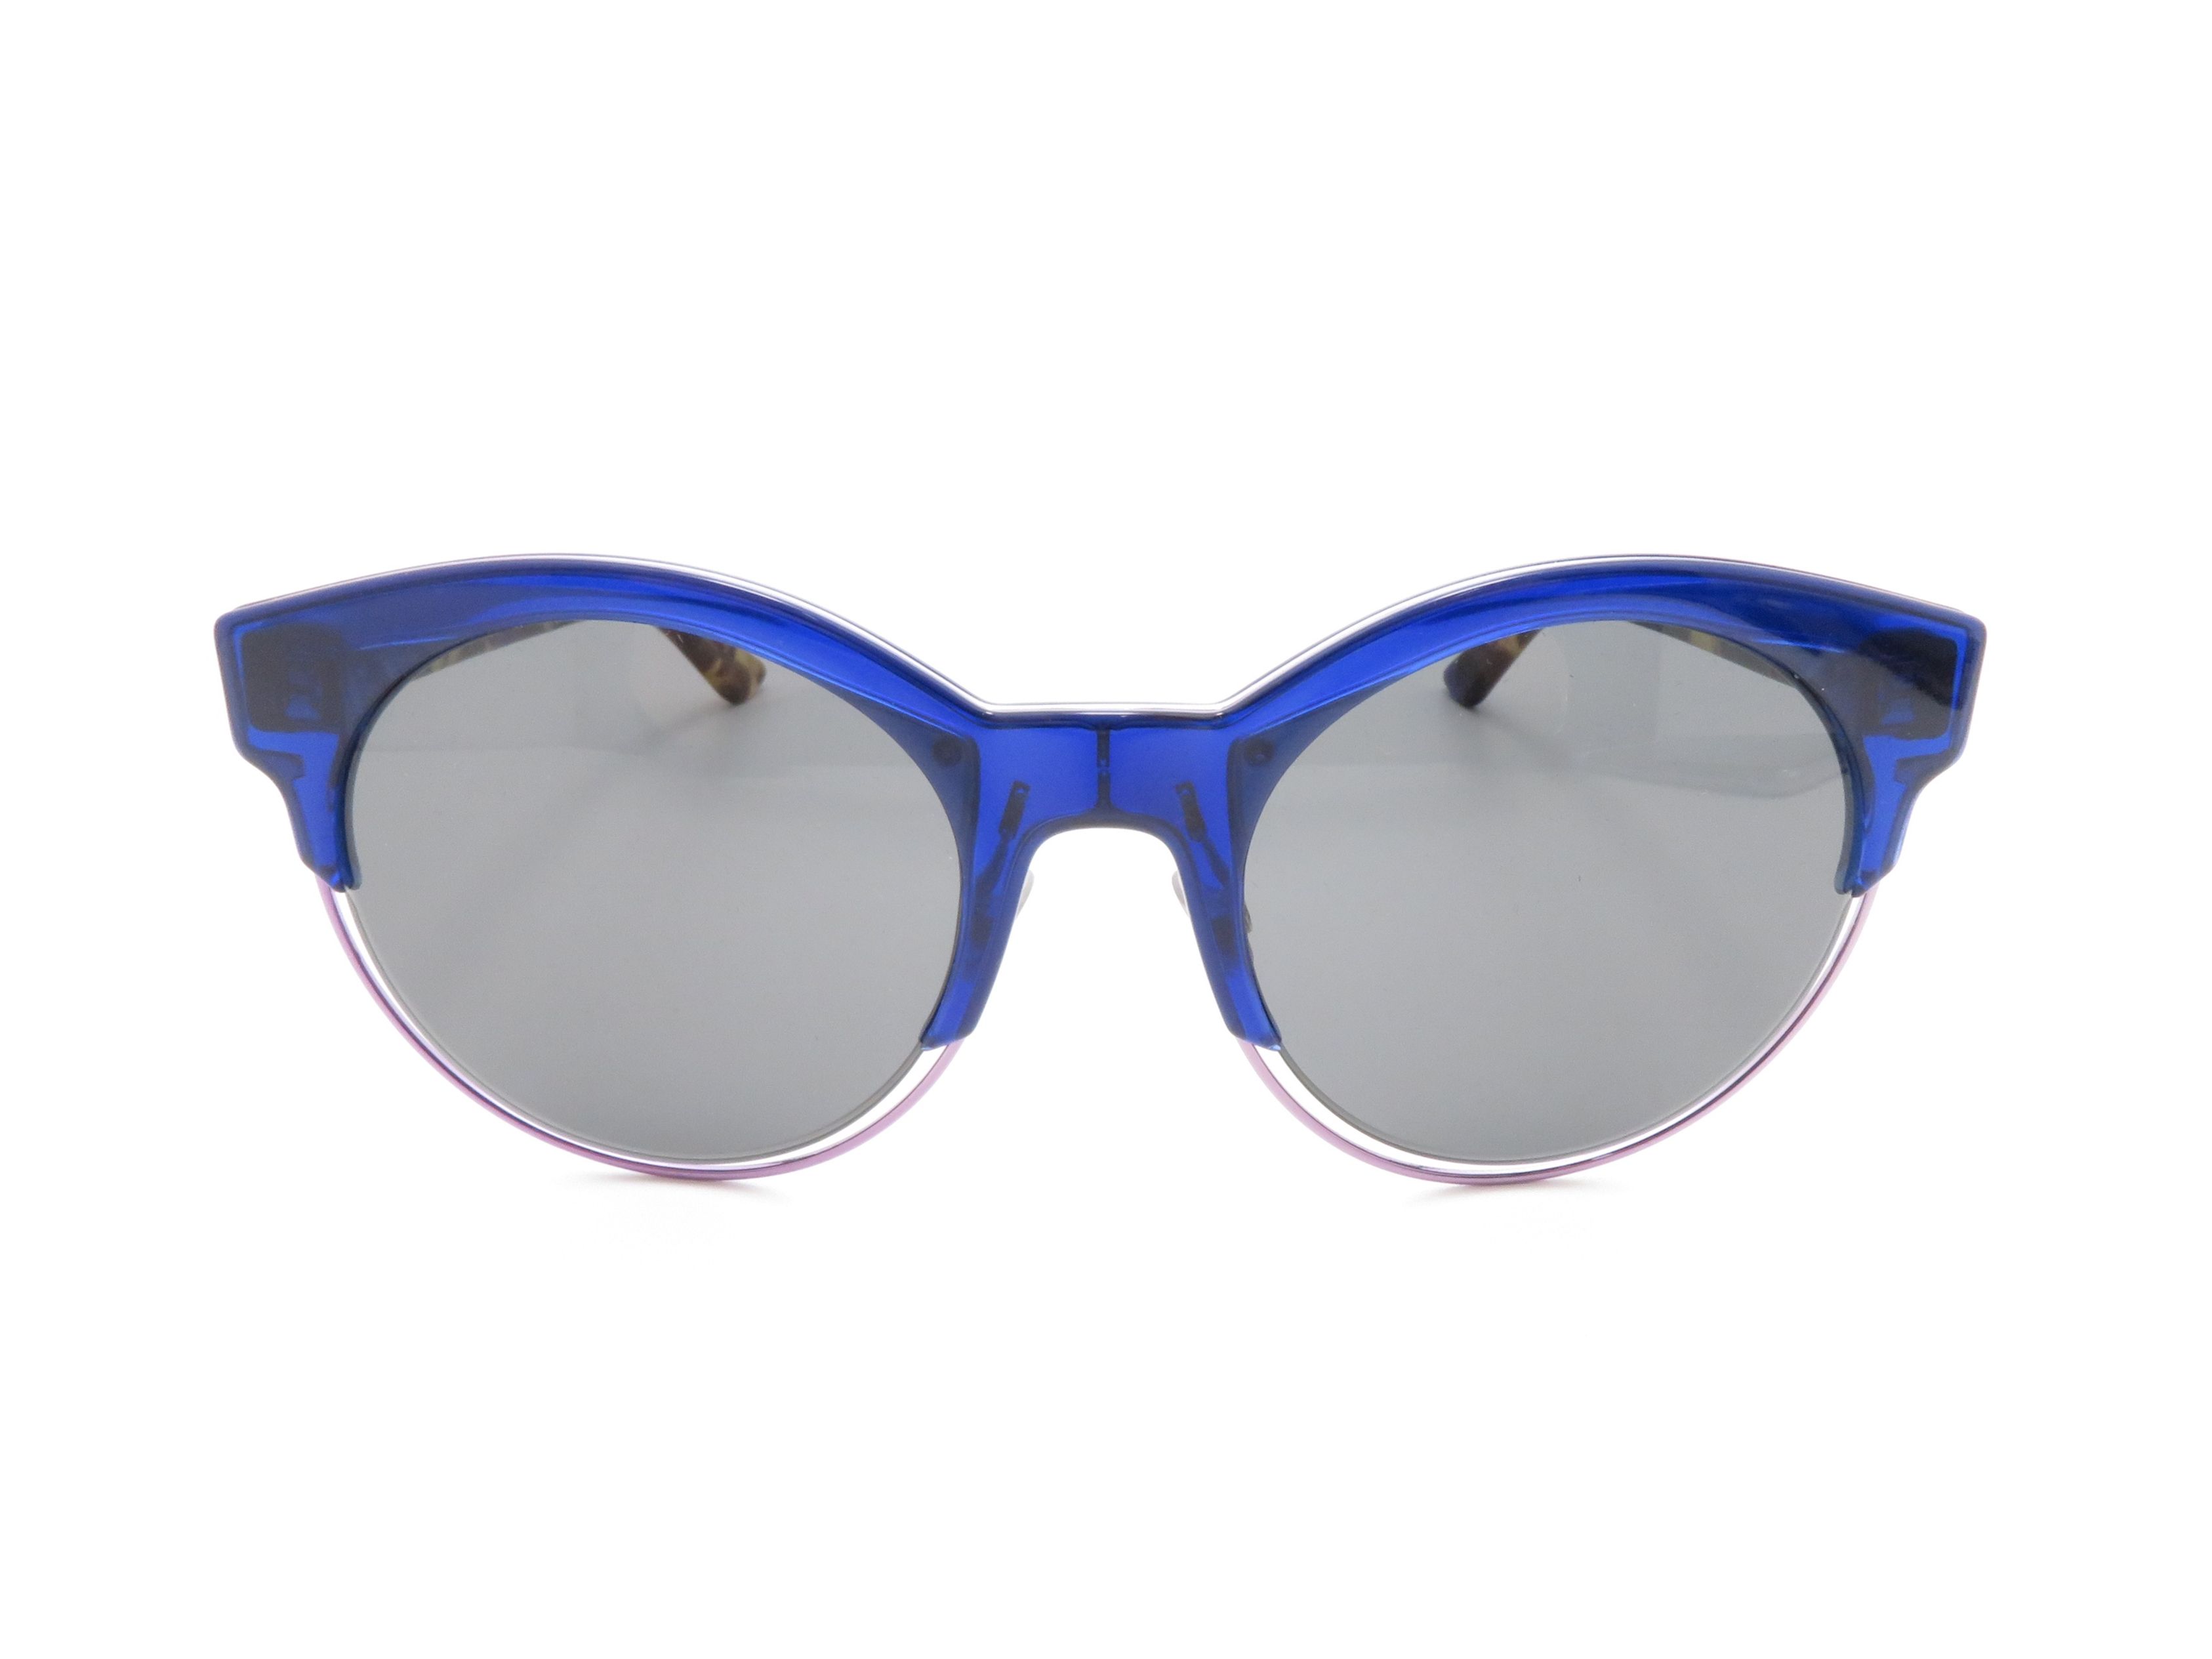 Dior ディオール サングラス ブルー/ブラウン プラスチック 【437】